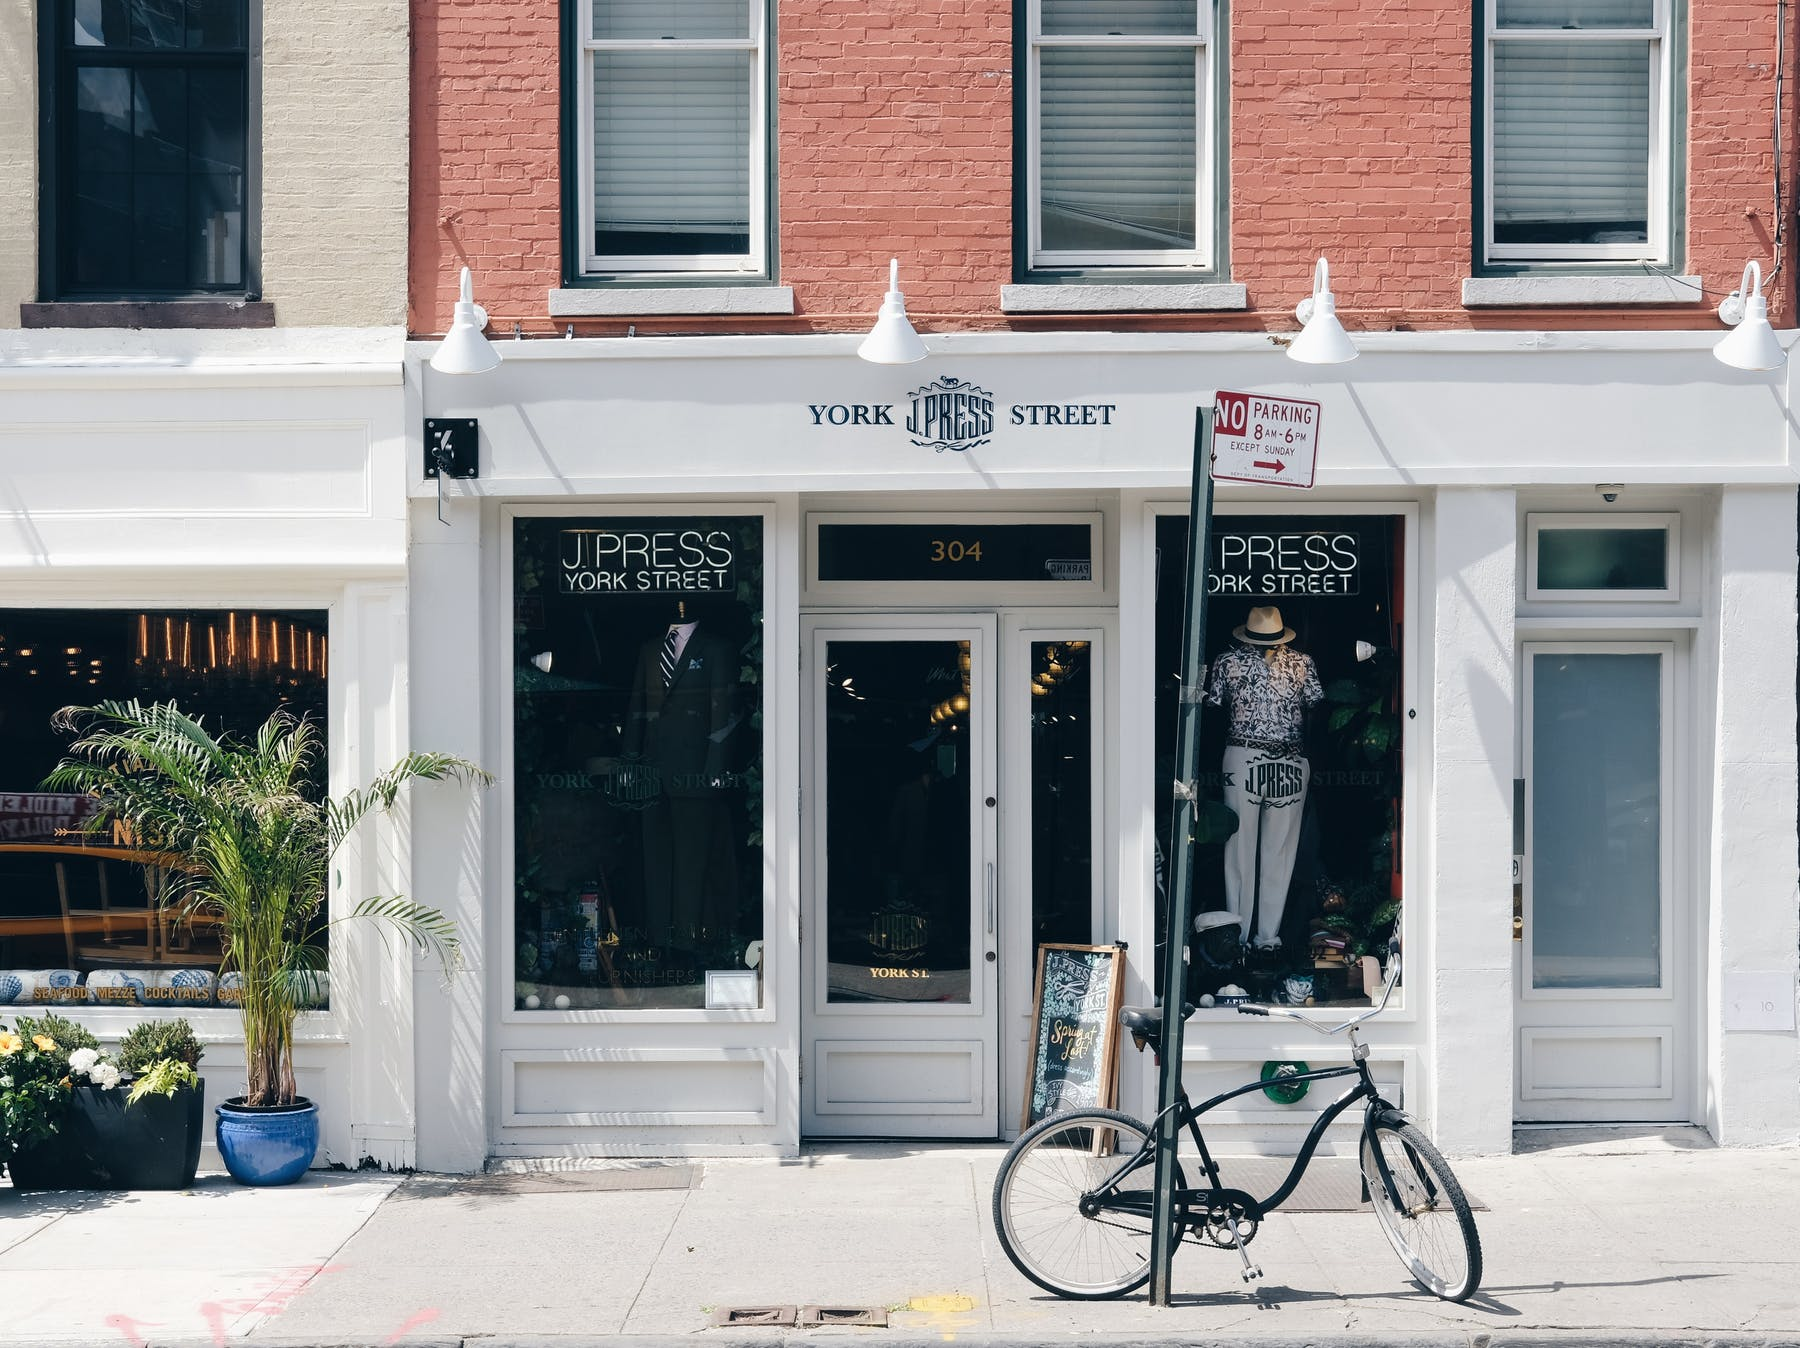 jpress york street store front